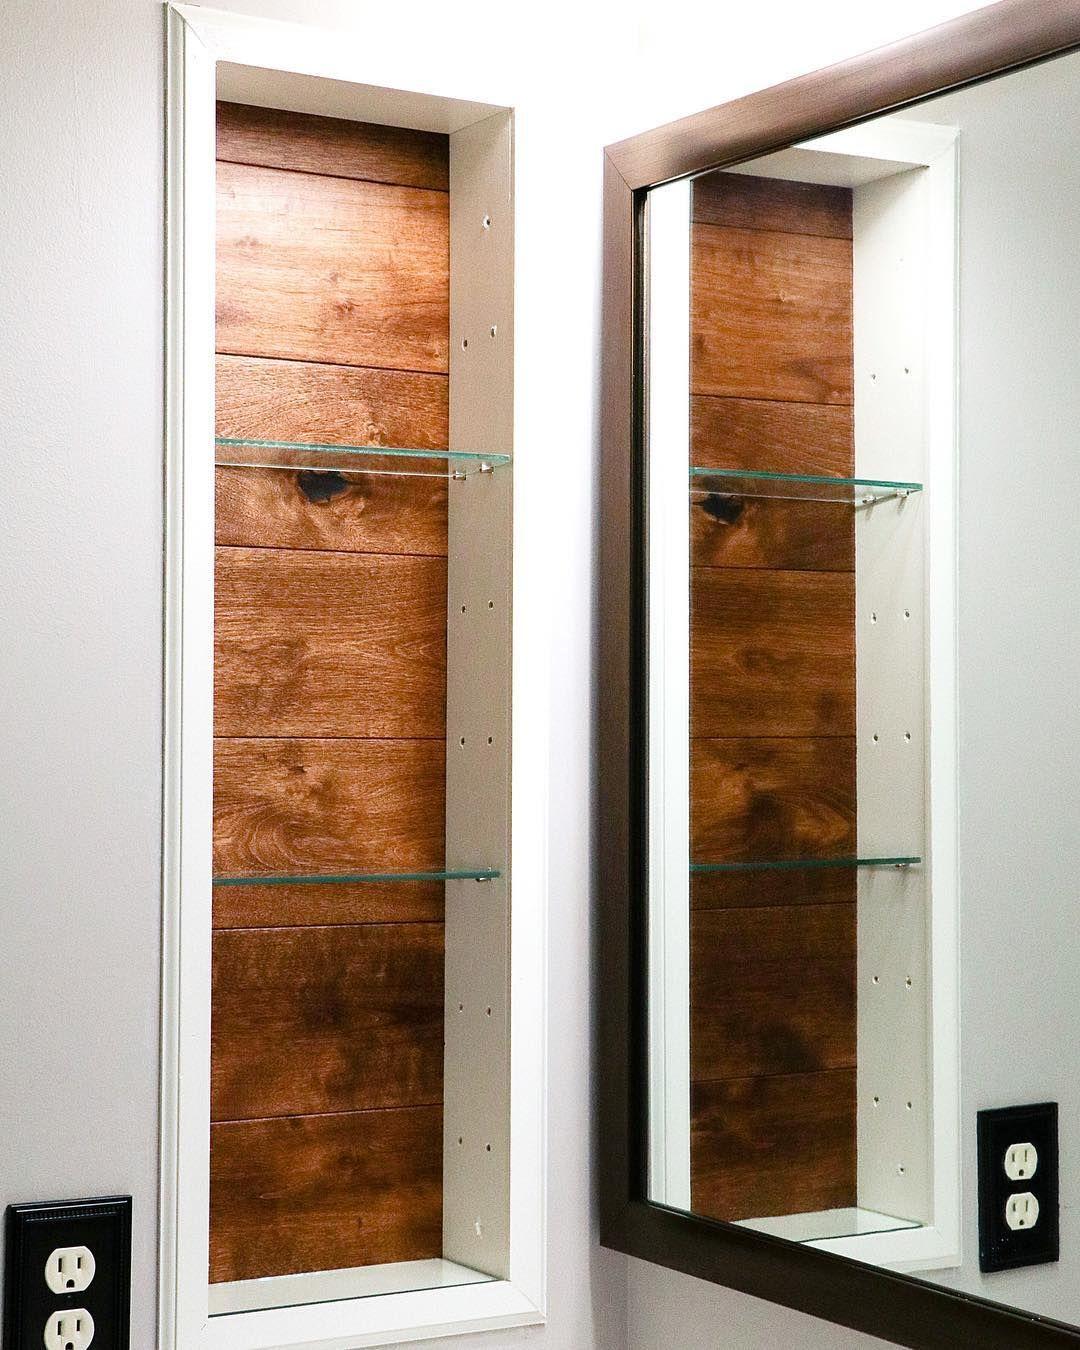 Replacing Bathroom Medicine Cabinet With Open Air Shelf Guide Medicine Cabinet Mirror Medicine Cabinet Makeover Bathroom Medicine Cabinet